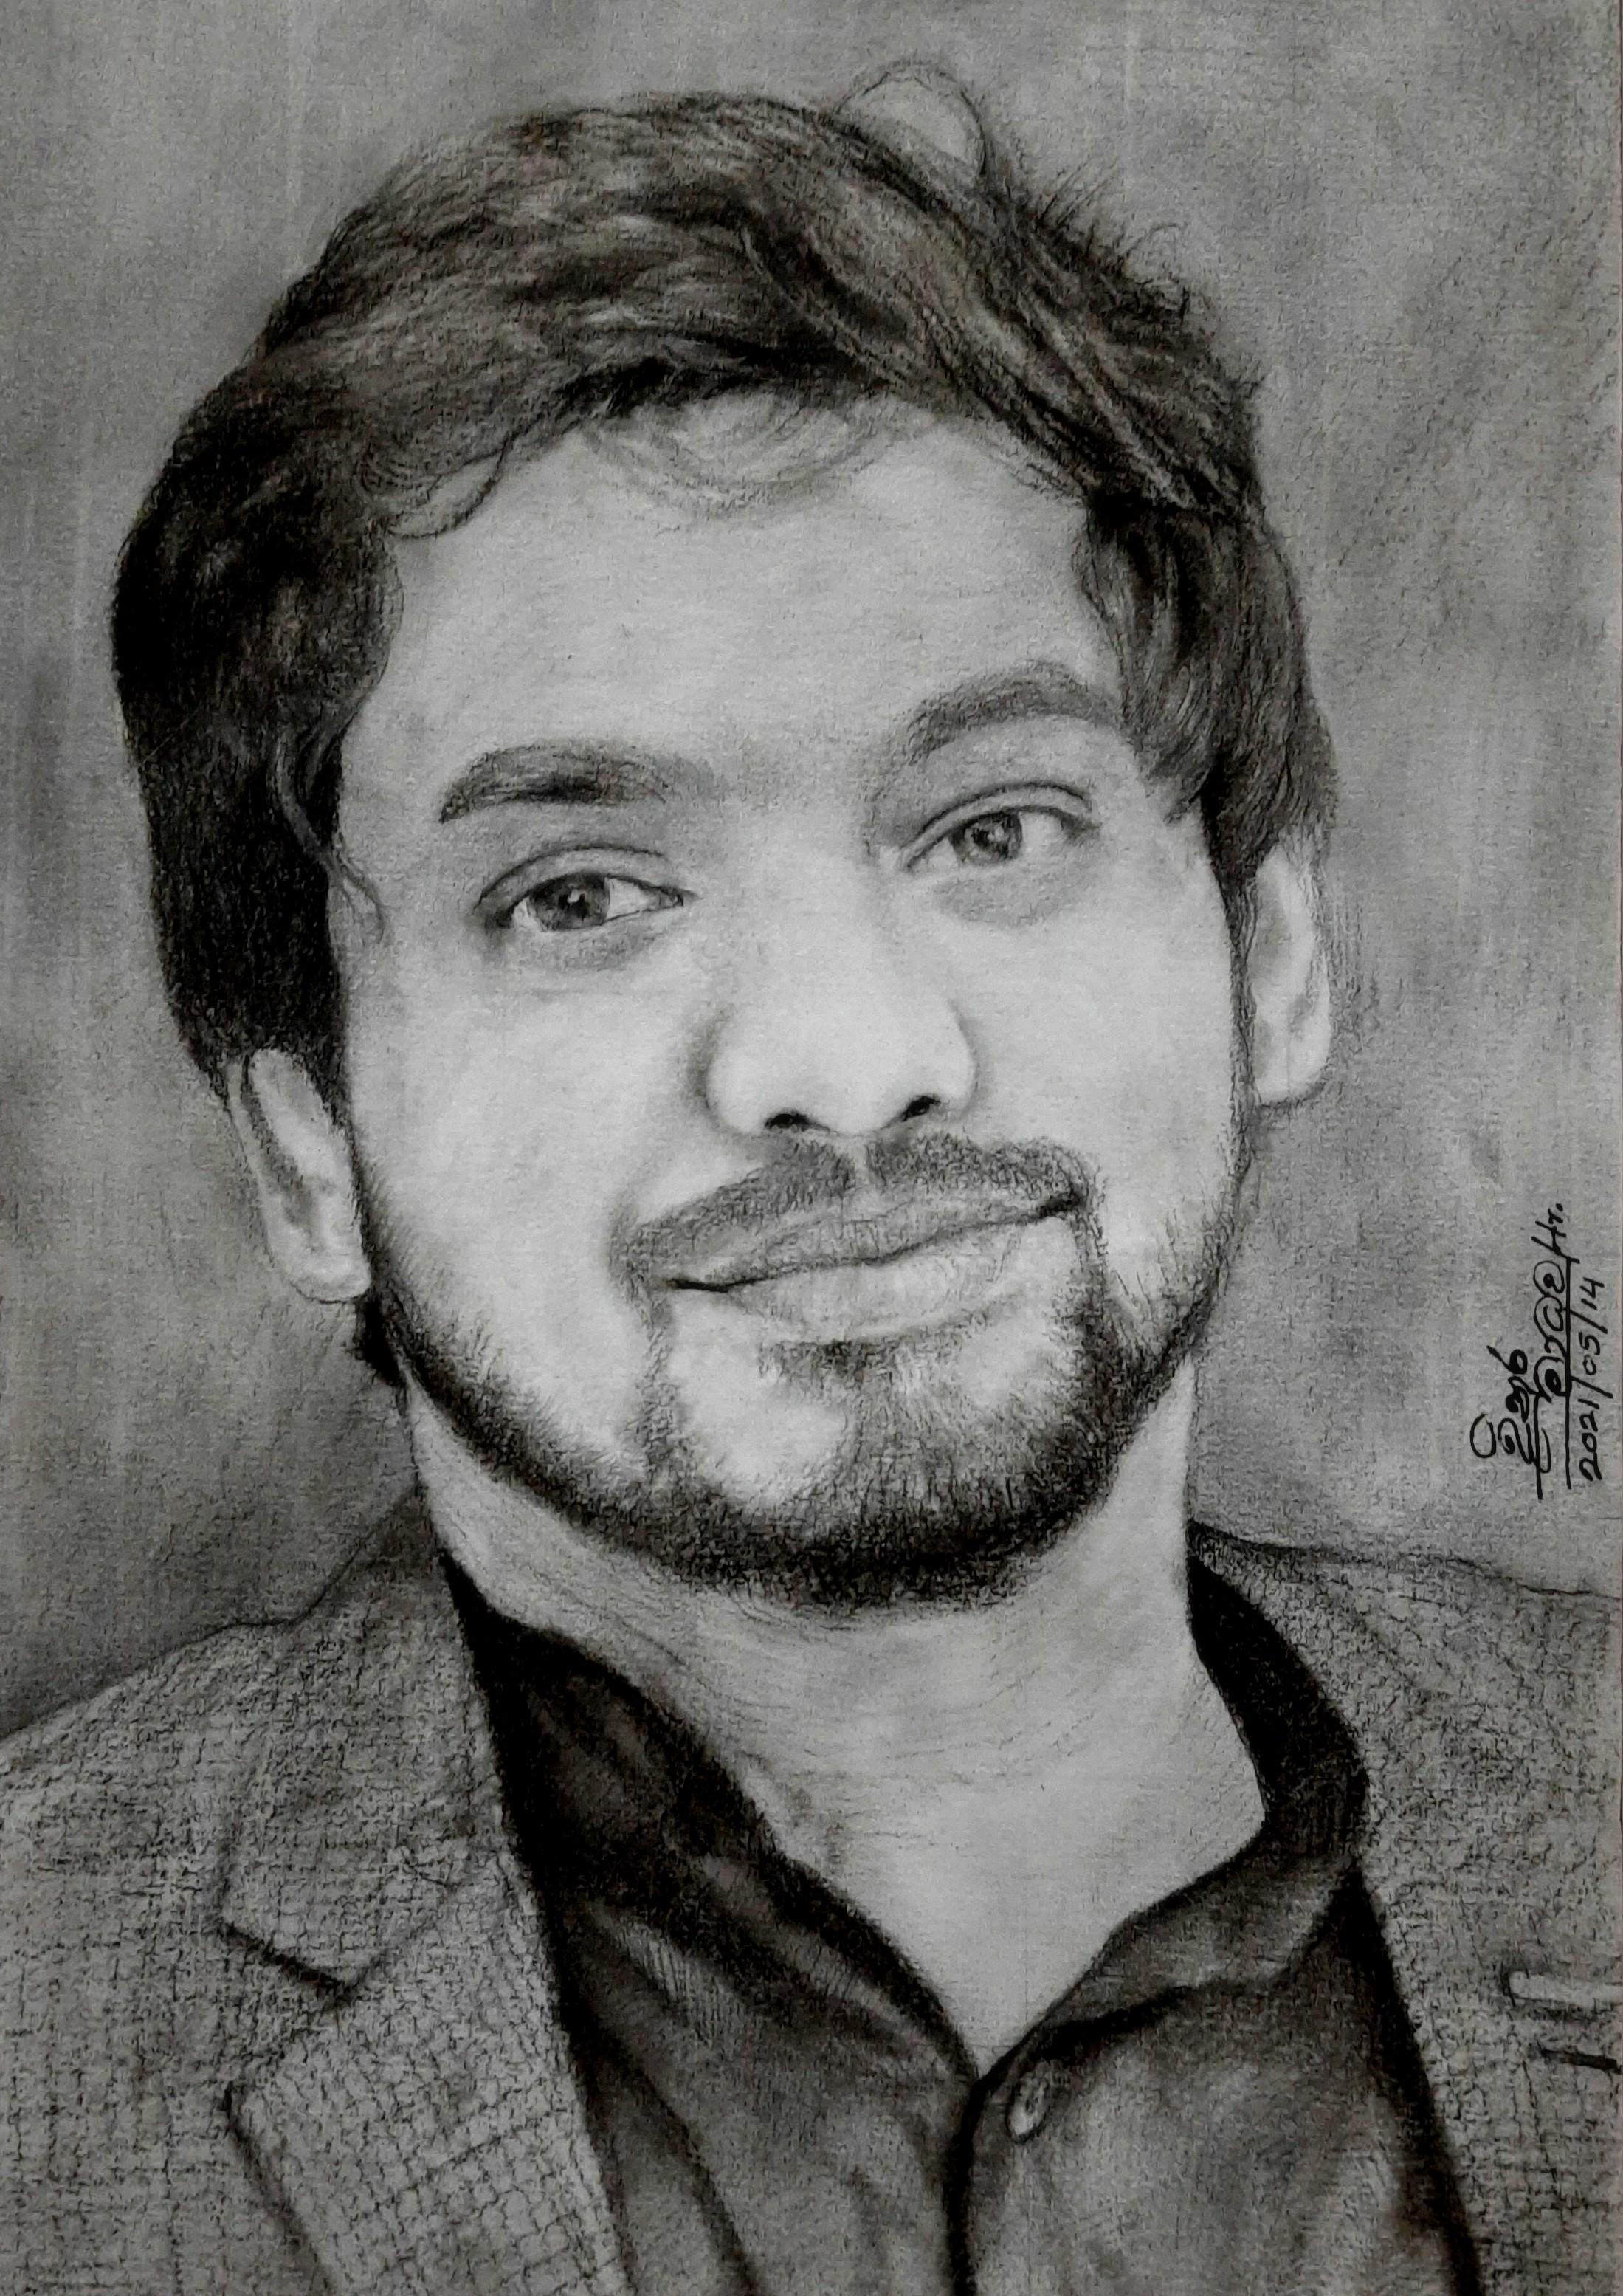 Portrait art-Ridma Weerawardena by Dinura Madhawa